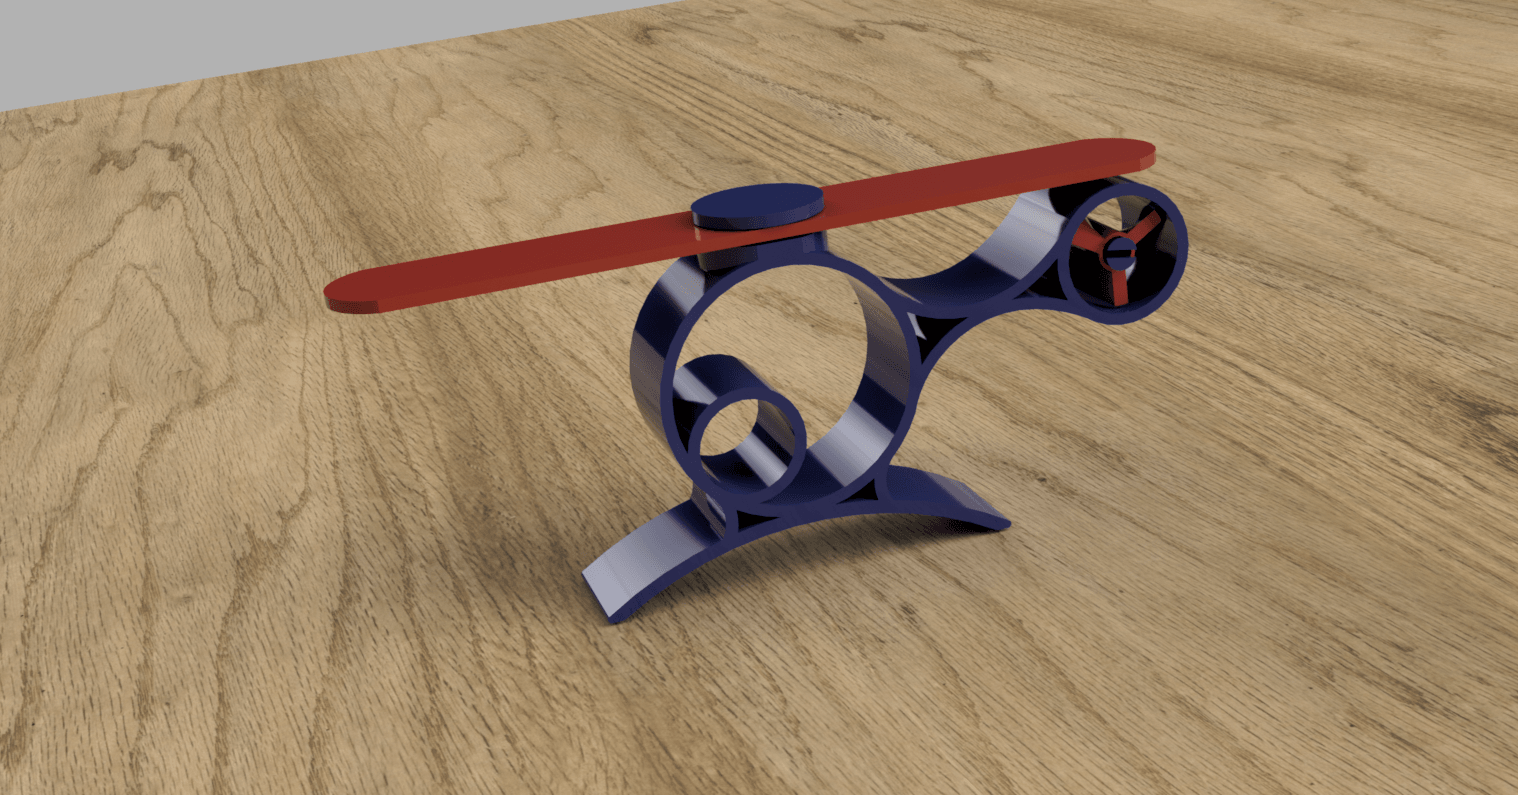 rendu_helico v2.png Download free STL file Helicopter child • 3D printing design, MME